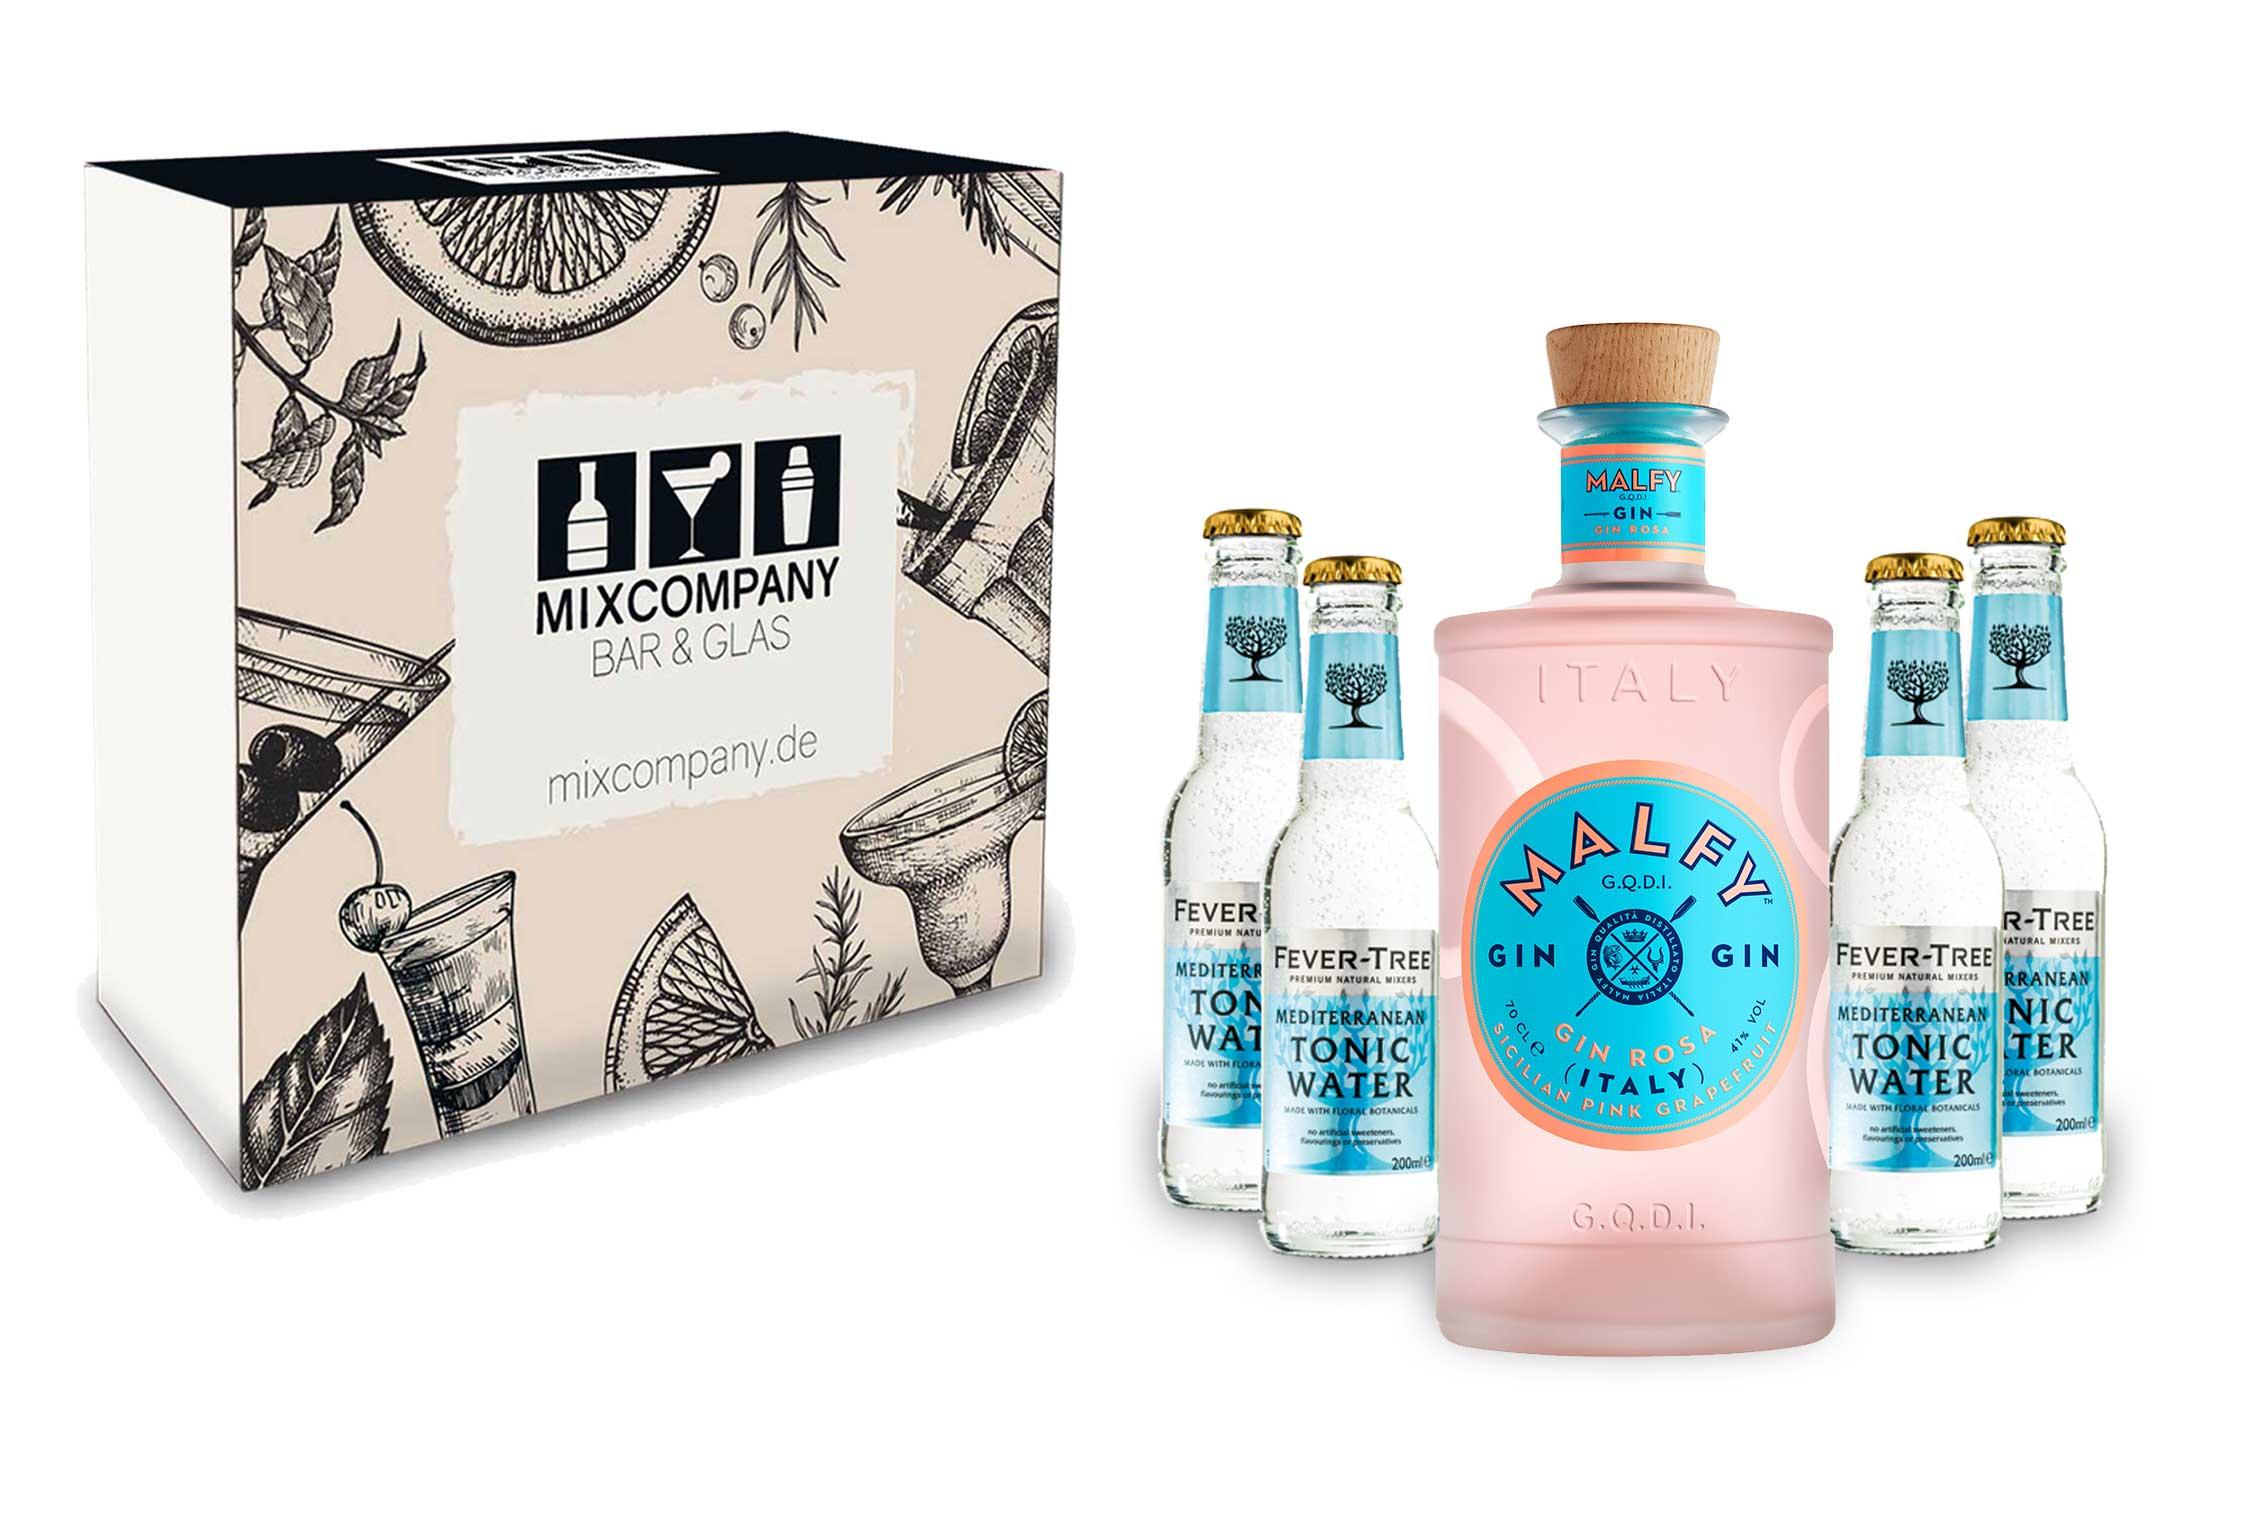 Malfy Gin Tonic Giftbox Set - Malfy Gin Rosa 0,7l - 700ml (41% VOL) + 6x Fever-Tree Mediterranean Tonic Water 200ml inkl. Pfand MEHRWEG- [Enthält Sulfite]